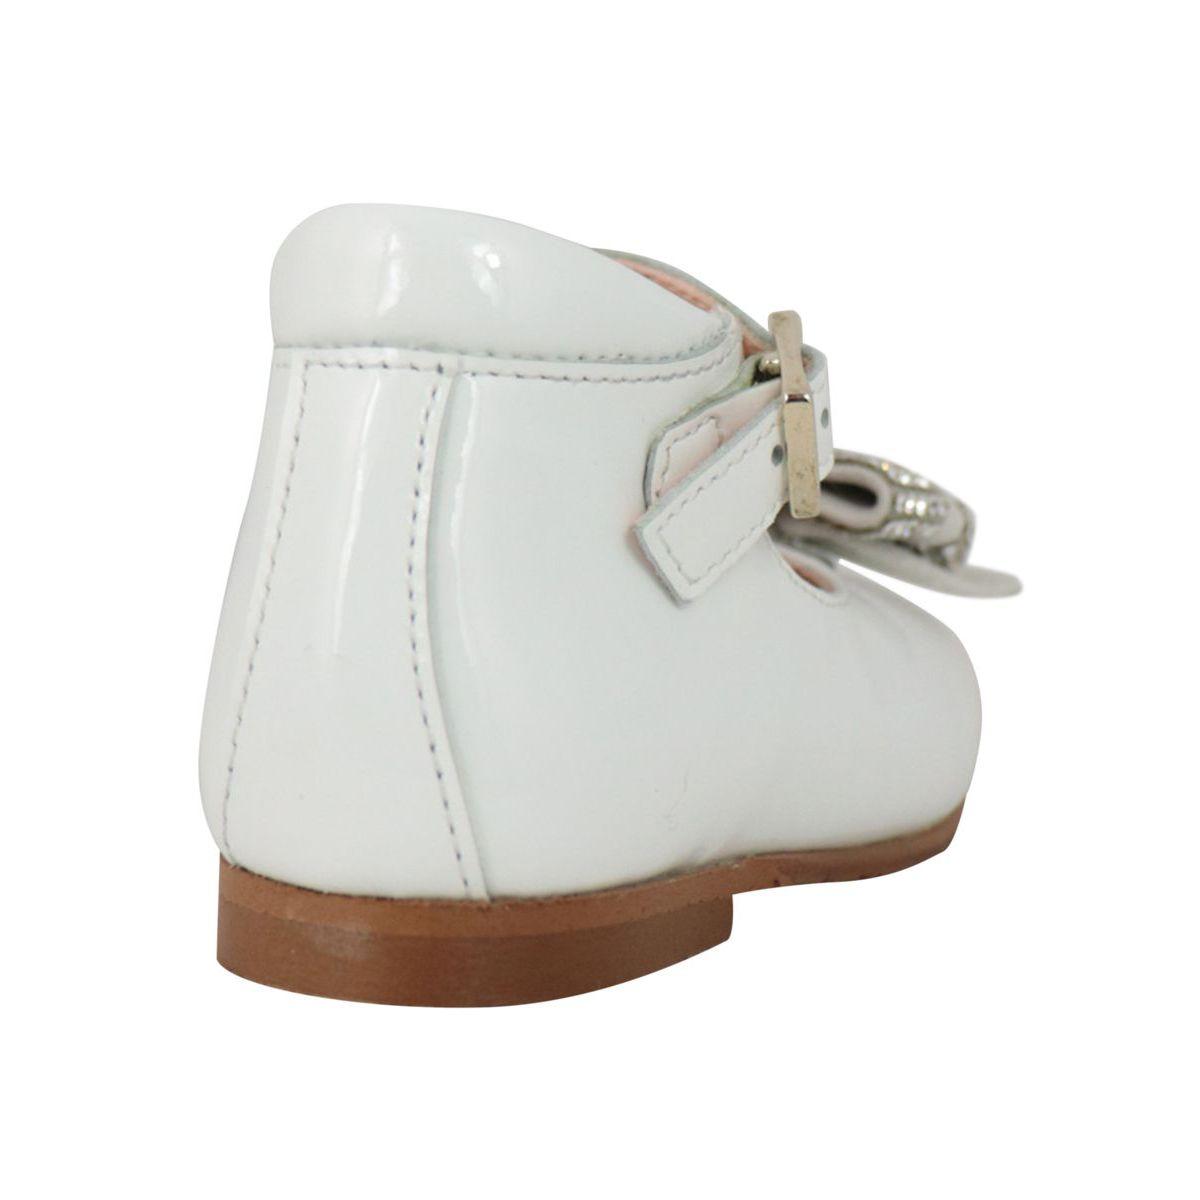 Ballerina shoe in shiny leather with rhinestone bow White Clarys